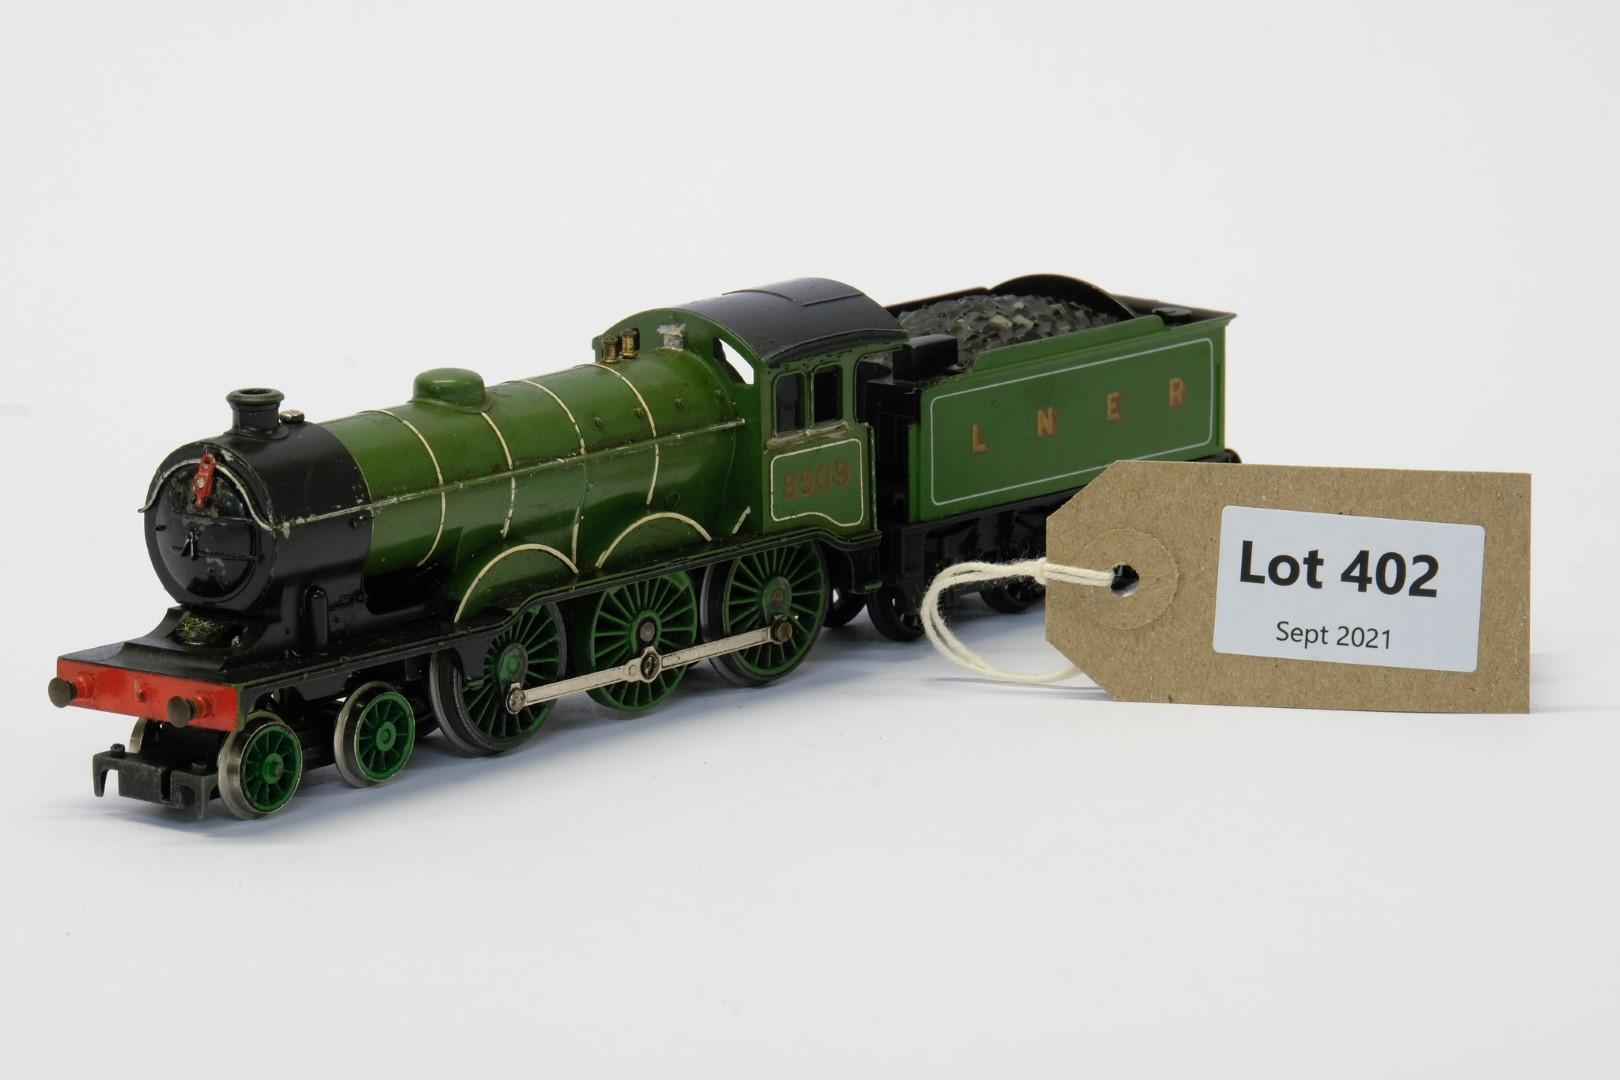 Hornby Class B12 4-6-0 8509 in LNER Green - No Box